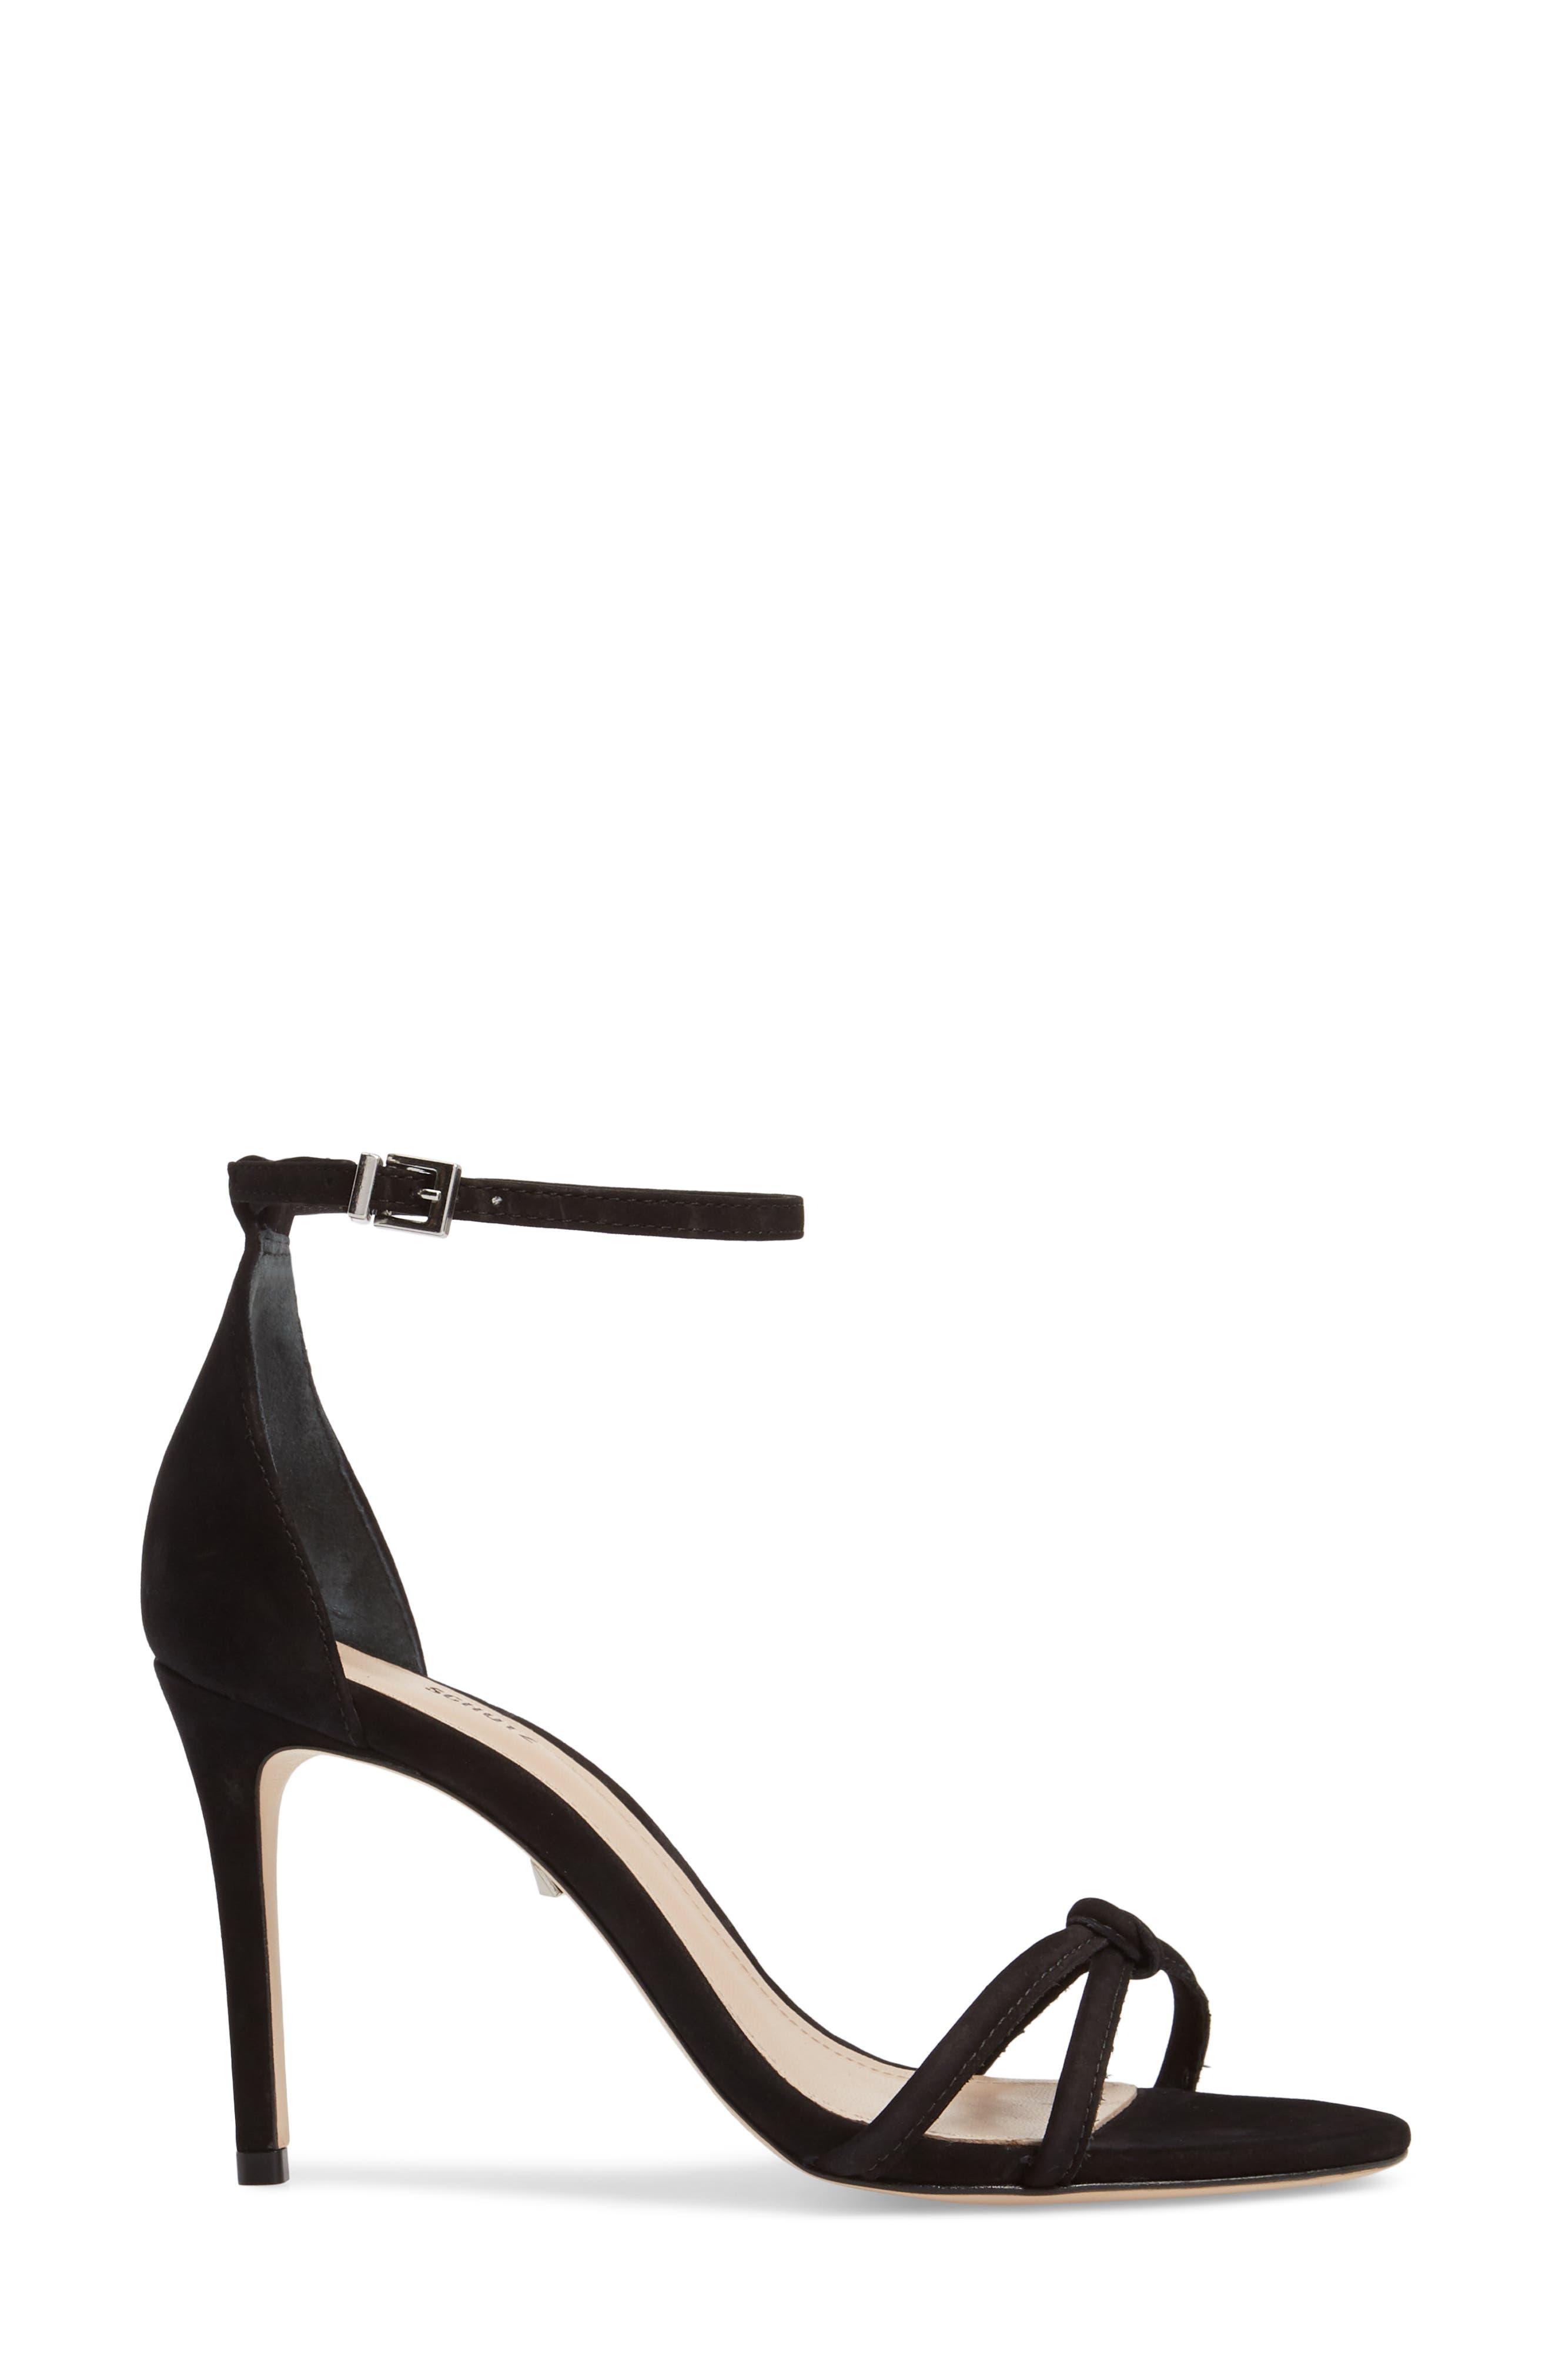 Rhana Ankle Strap Sandal,                             Alternate thumbnail 3, color,                             Black Leather